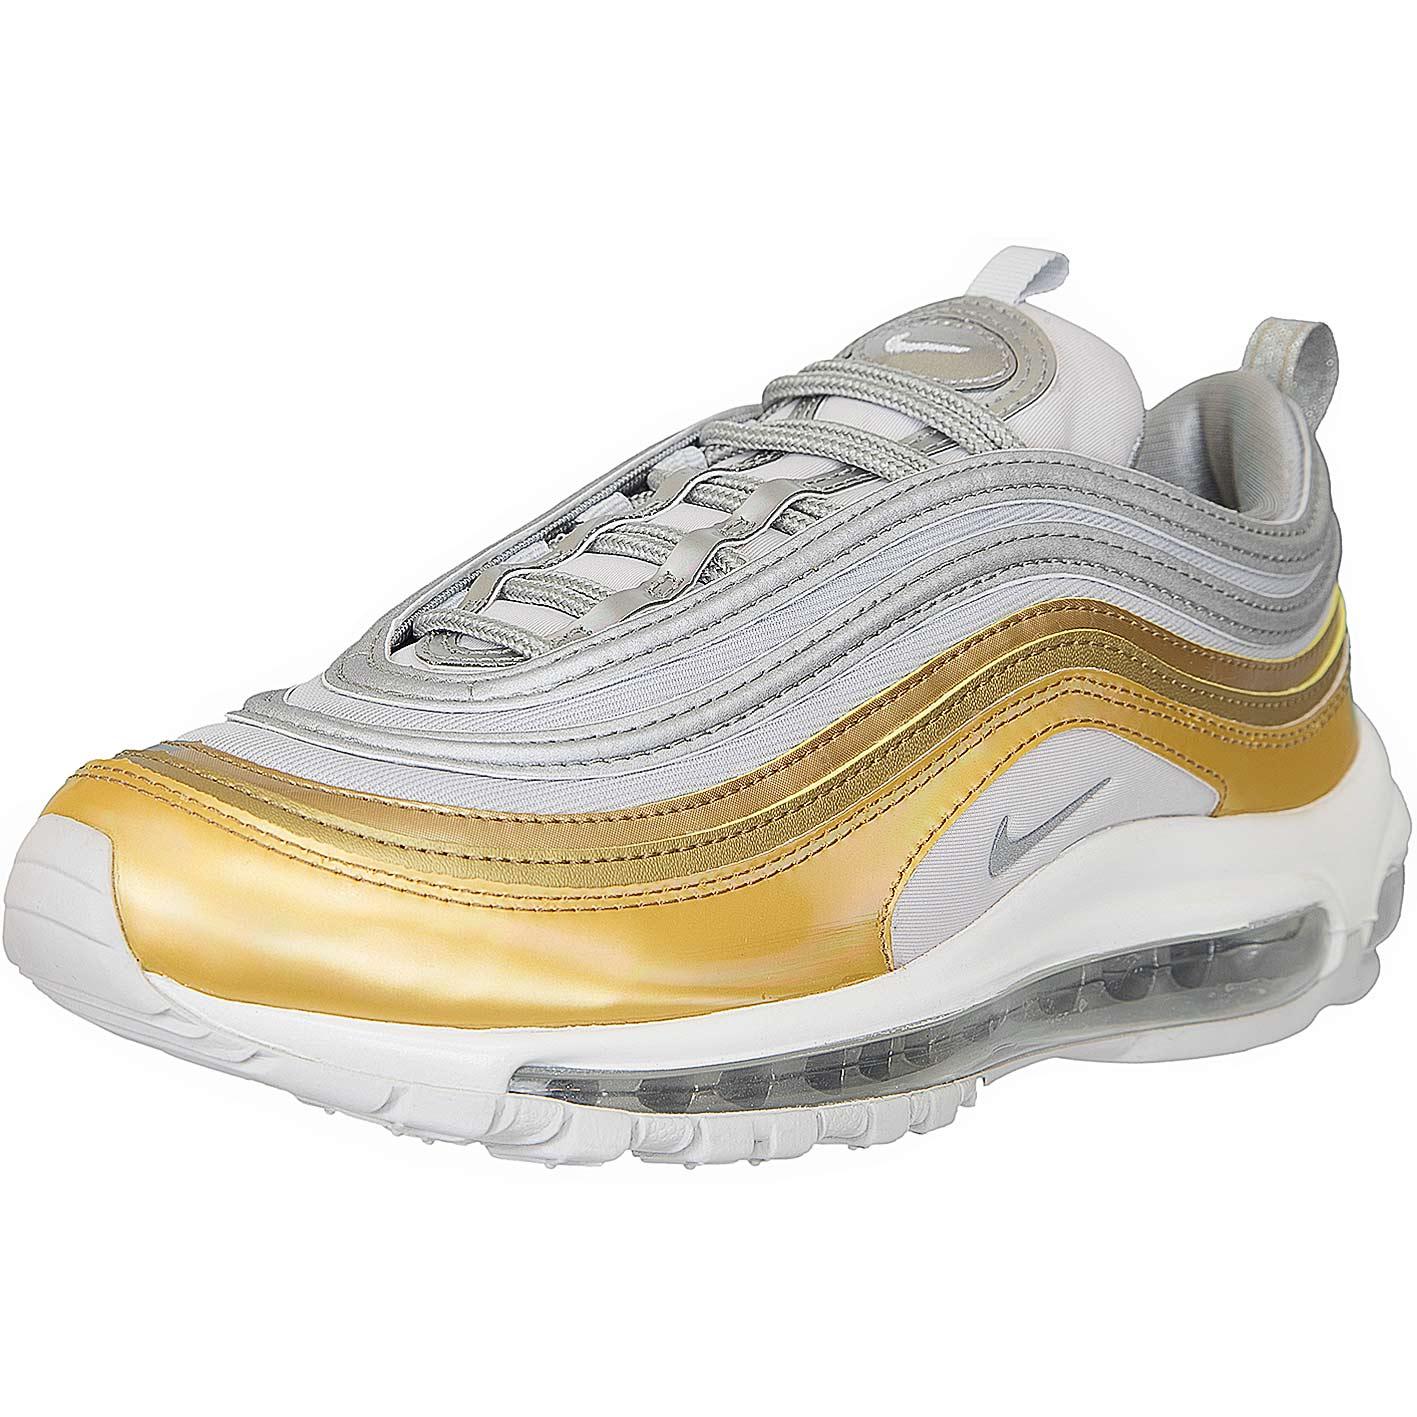 arriving online retailer the best attitude Nike Damen Sneaker Air Max 97 SE grau/silber